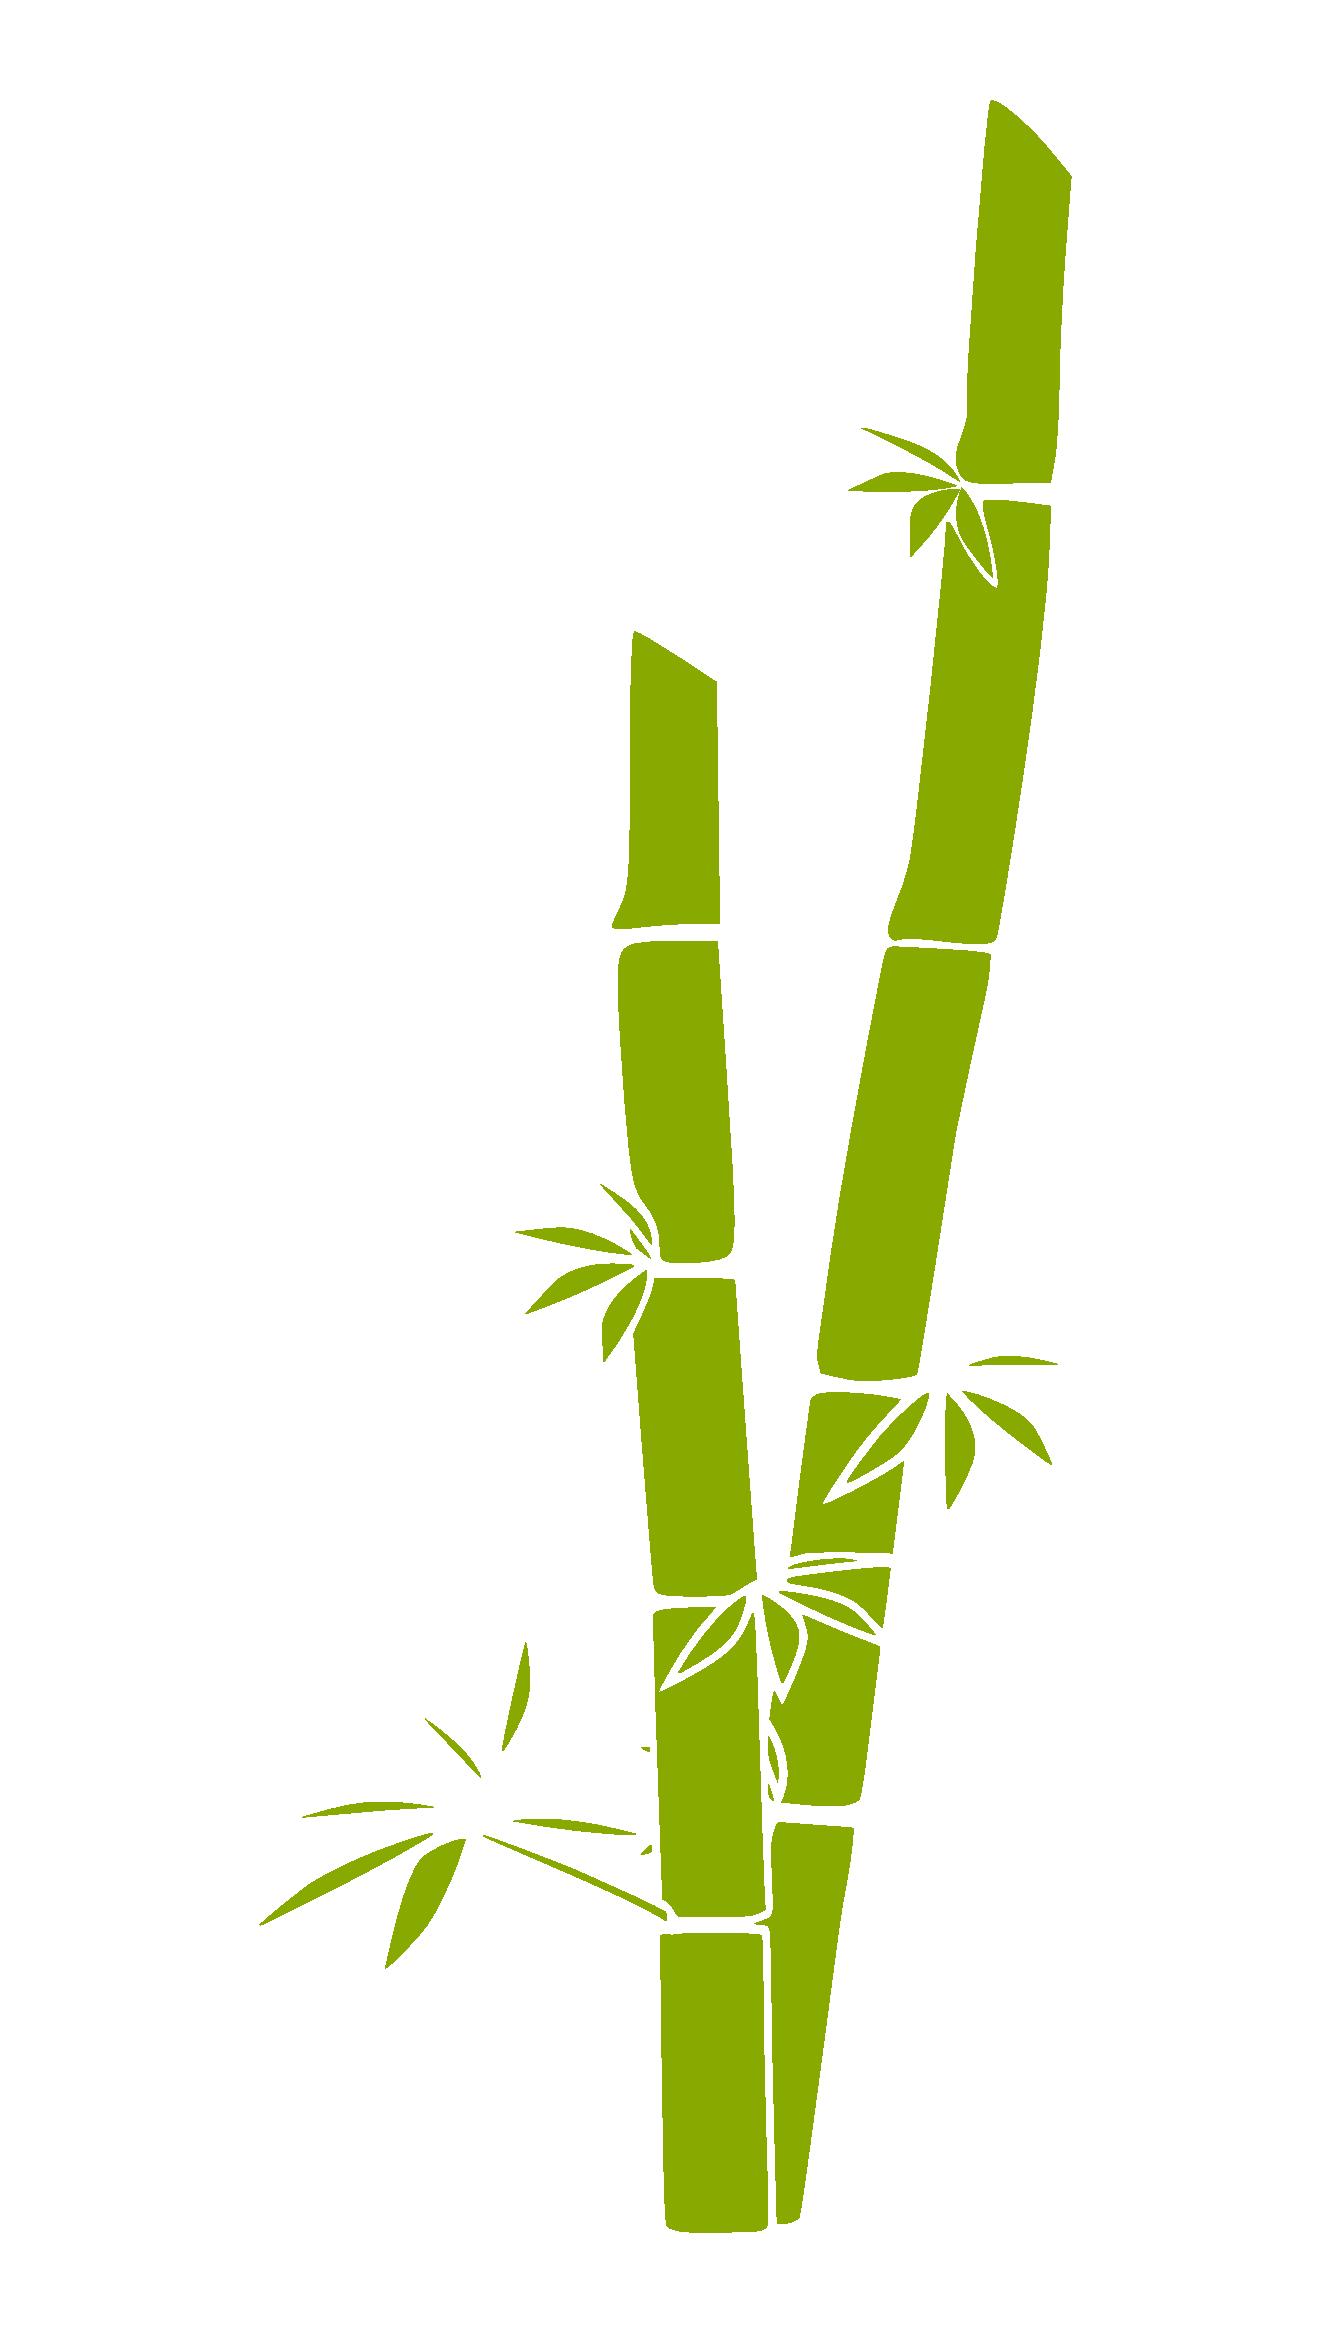 Bamboo Grass Tree 114 555px.png ...-Bamboo Grass Tree 114 555px.png ...-0